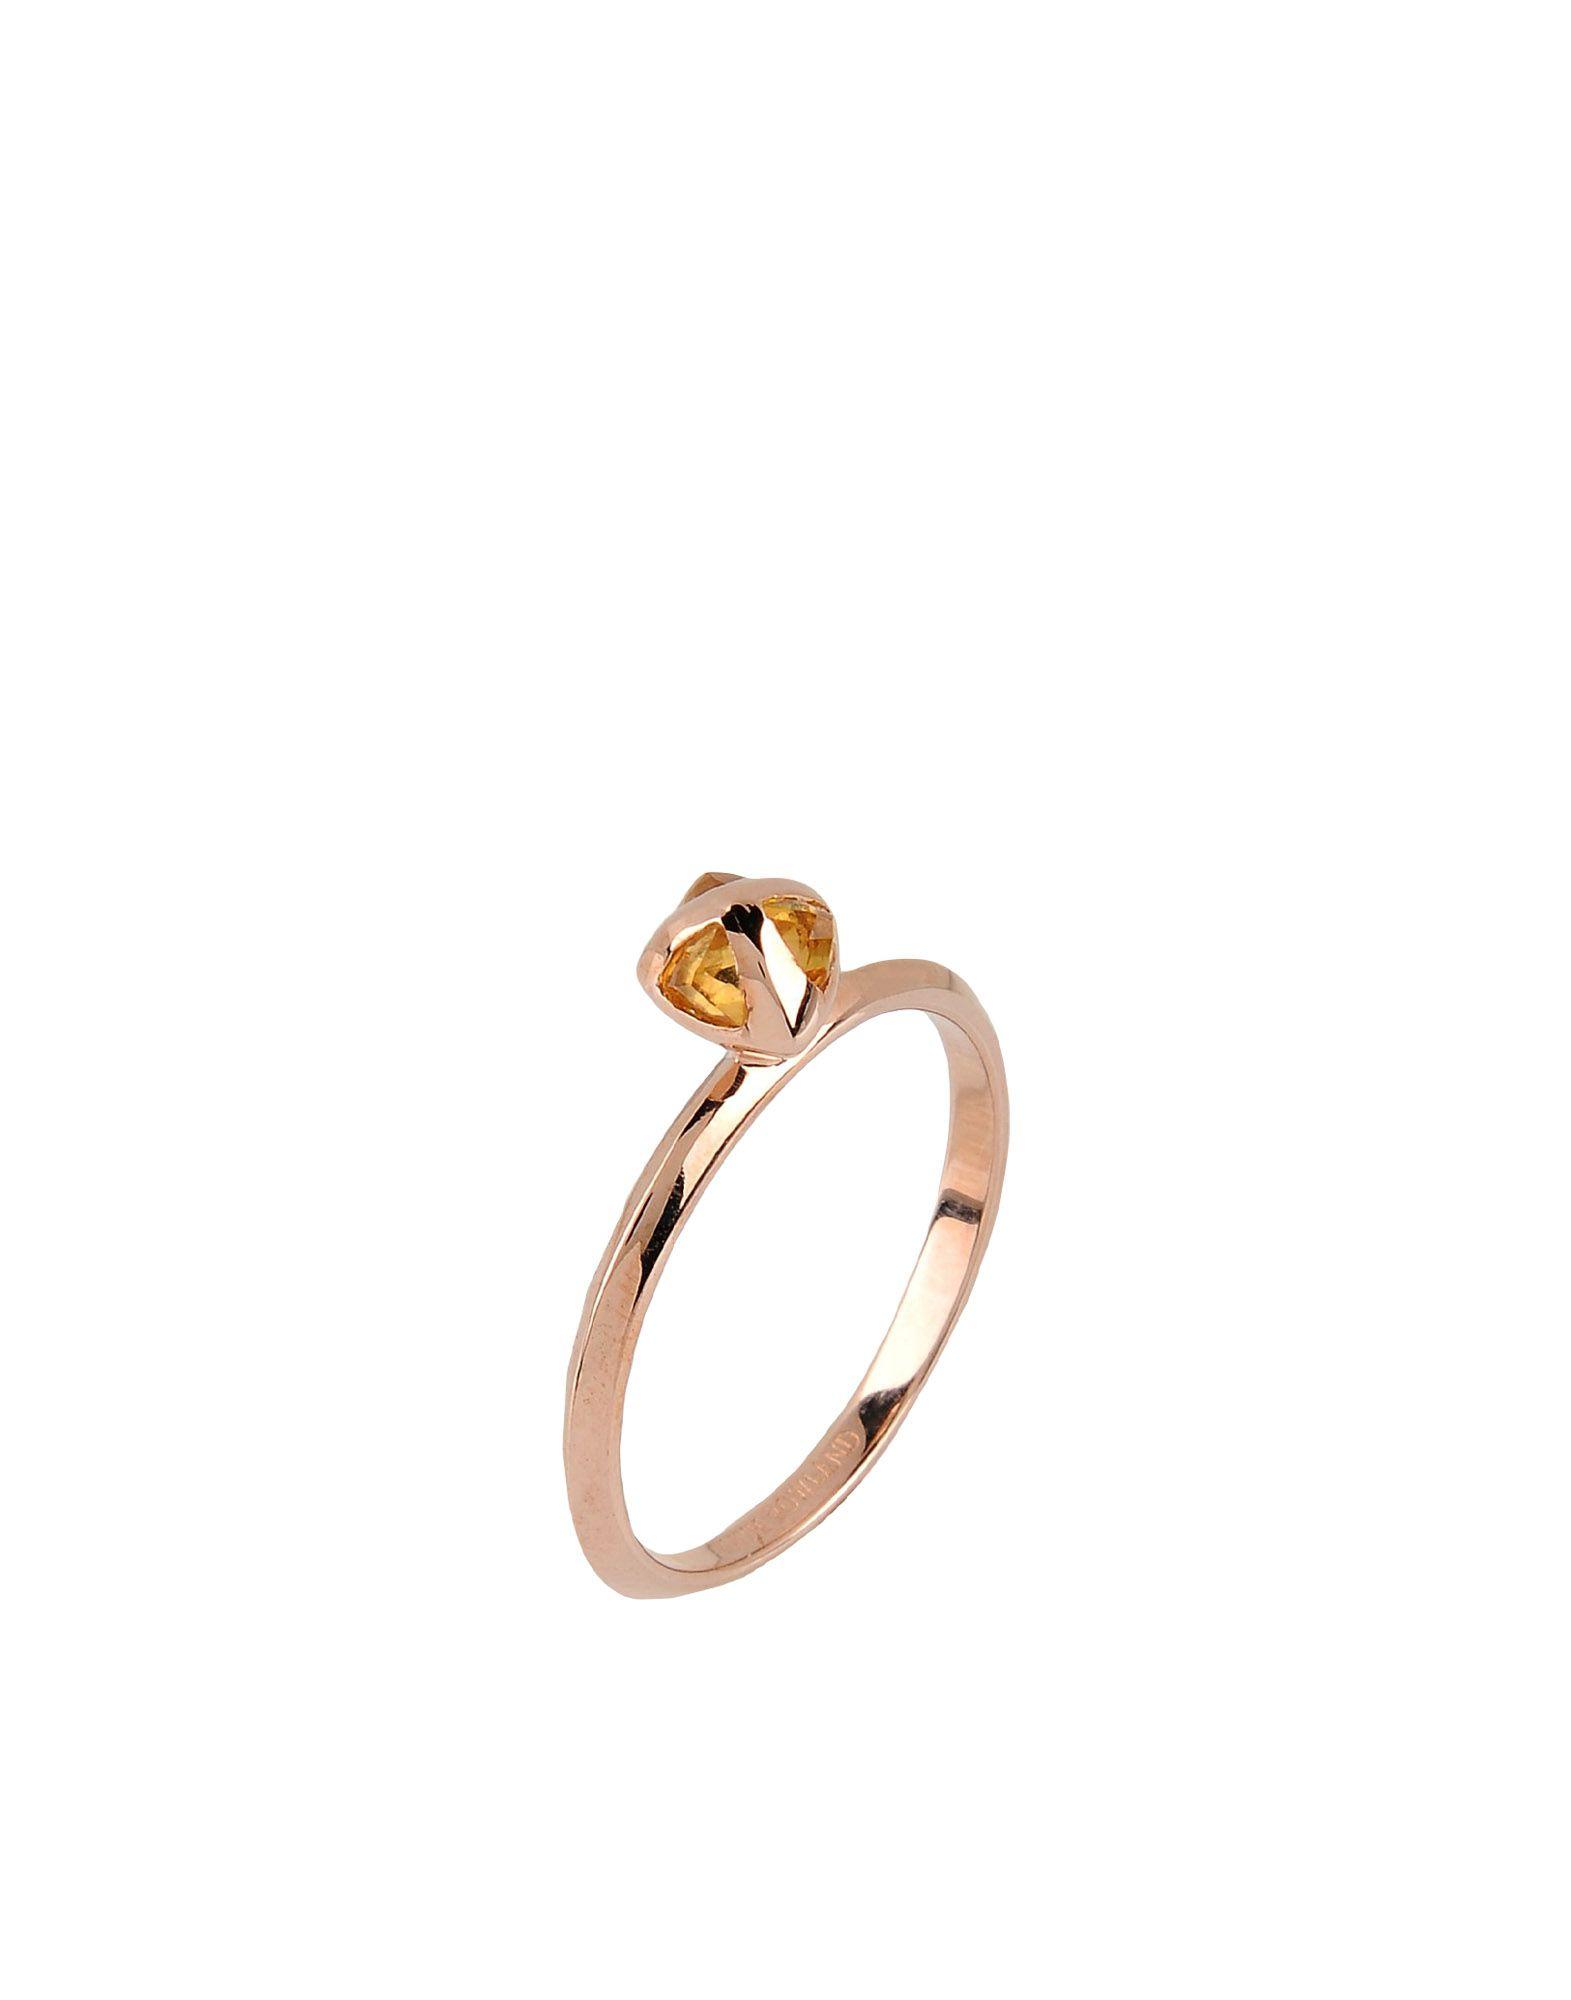 KATIE ROWLAND Damen Ring Farbe Altrosa Größe 17